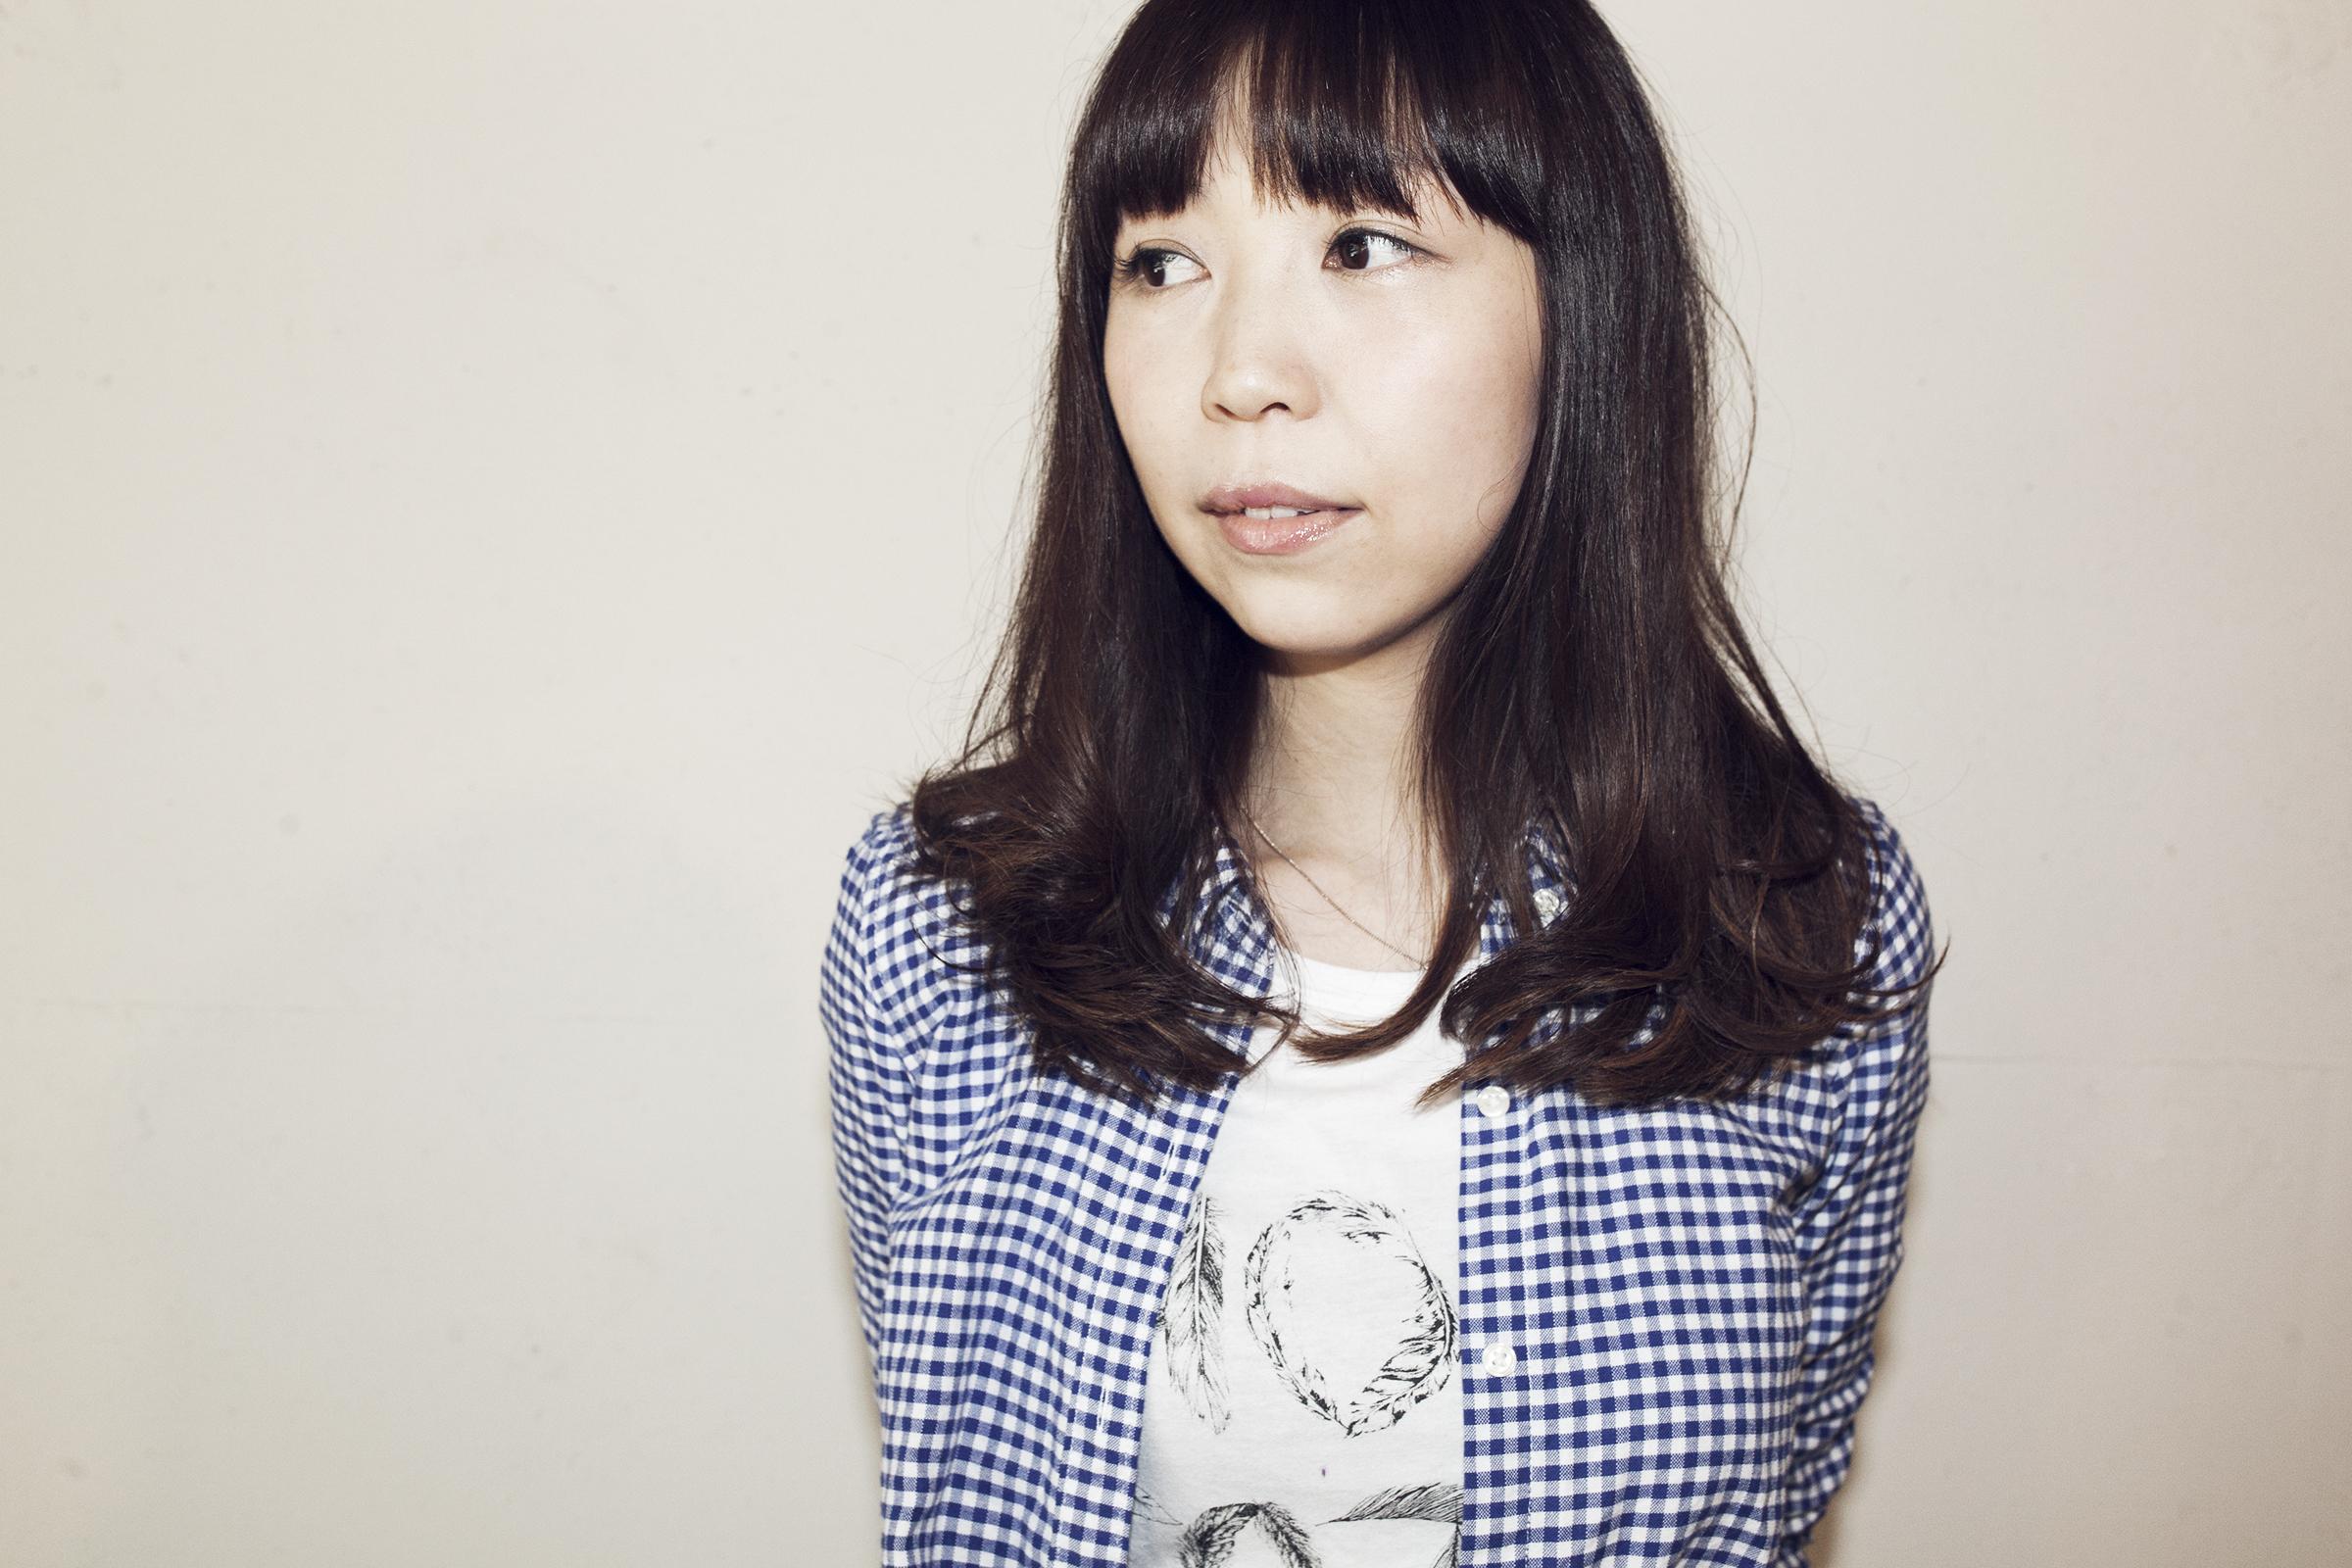 Miki Shiotani   塩谷美樹  Stylist  山形県出身。 仙台理容美容専門学校卒業 1998年、仙台大手サロン入社。アシスタント業を経て上京。 2001年、都内サロンに入社。アシスタント時代を経てスタイリストとして活動。社内アップコンテストで優勝。 2006年、Savaオープンと同時に参加。サロンワークの他、ヘアメイクの活動を開始。 2010年、Sava Keyaki店open。スタイリストとしてサロンワークの他、セットサロンの仕事を兼務する。 2011年、Sava Sakura店異動。スタイリストとしてサロンワークに専念する。